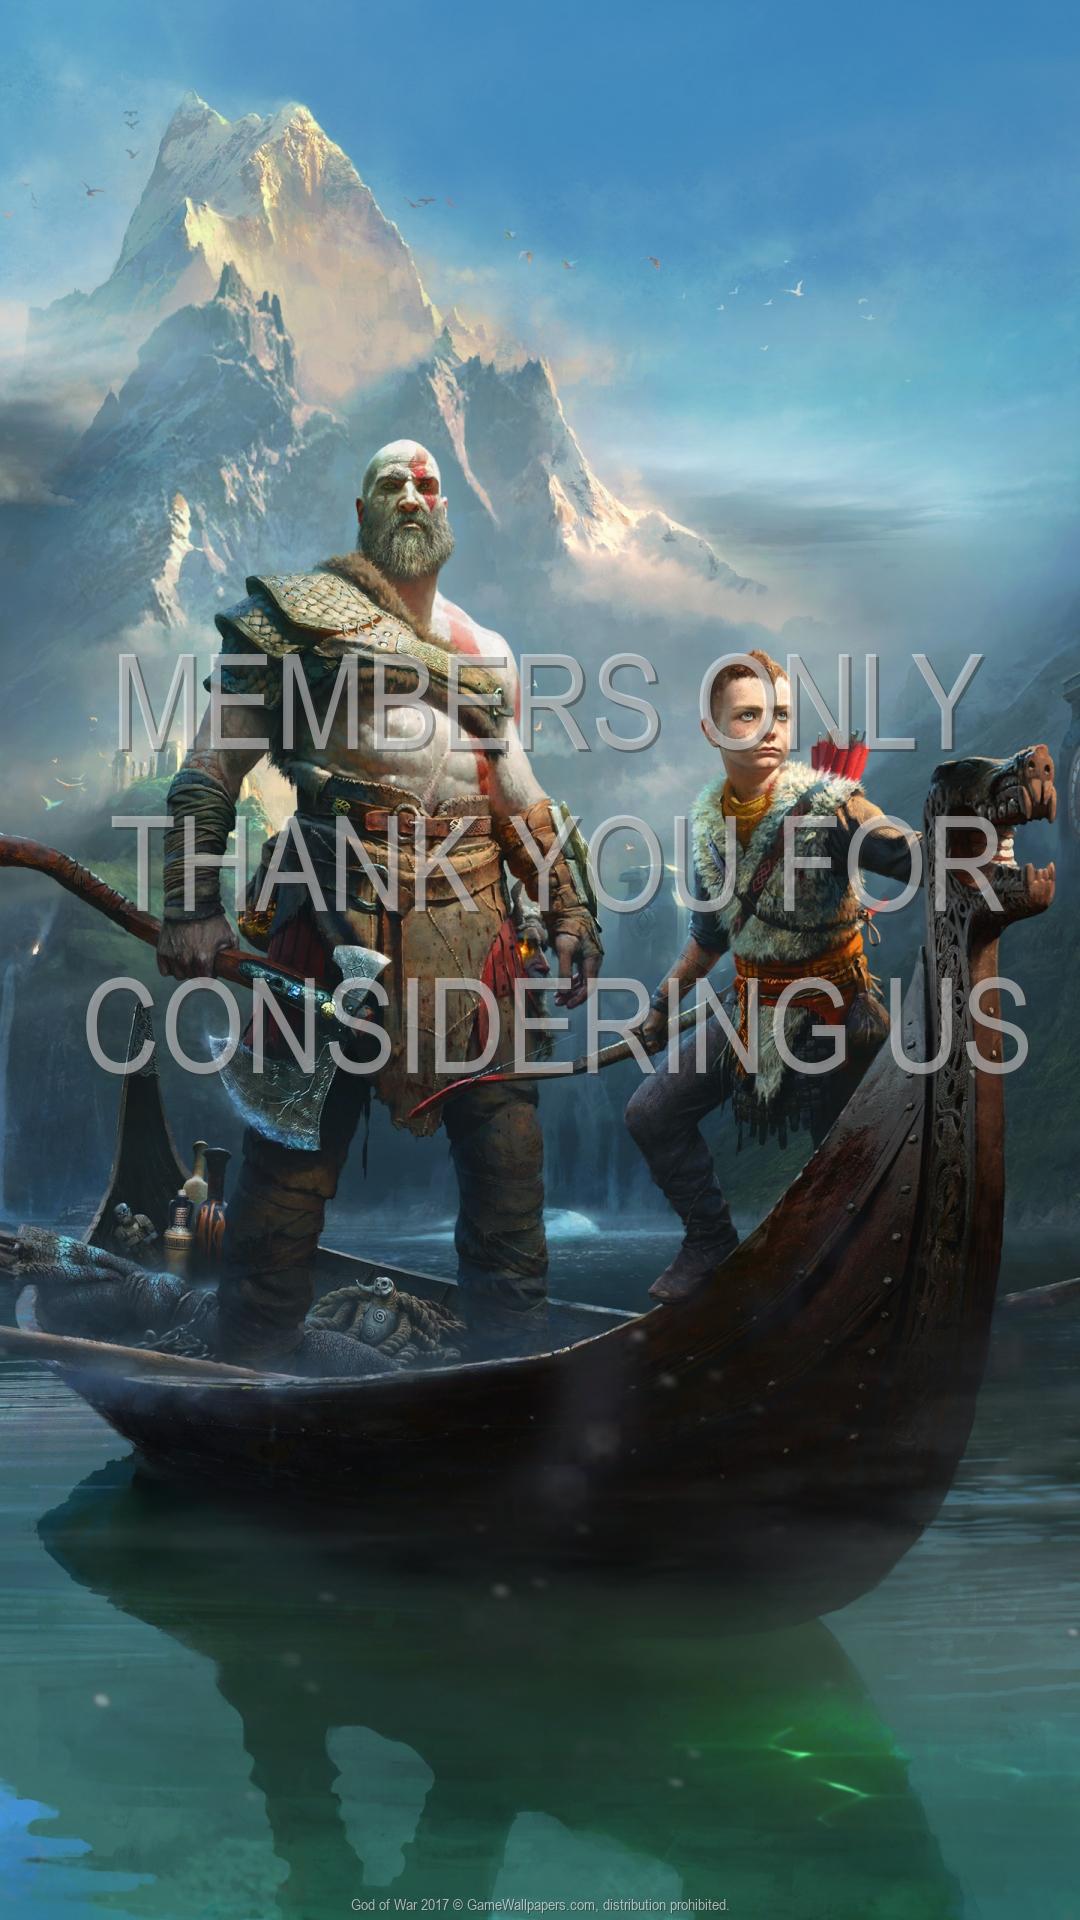 God of War 2017 1920x1080 Mobile wallpaper or background 03